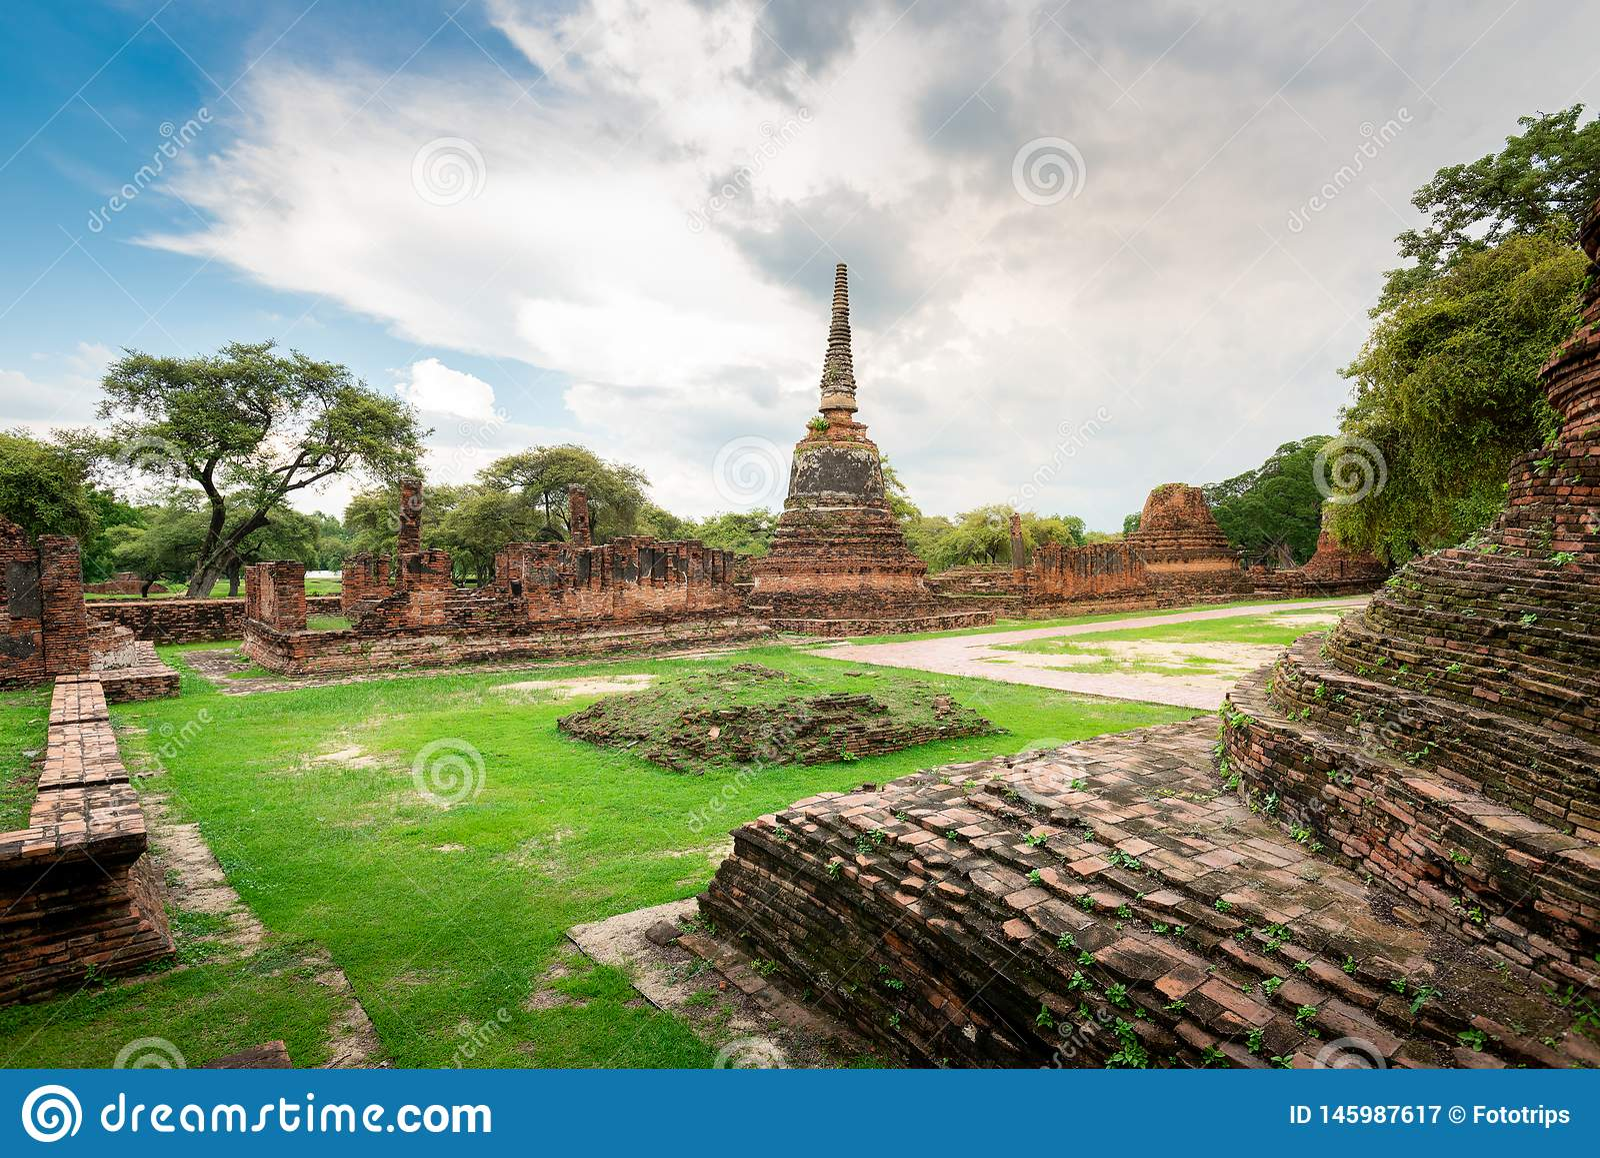 O templo de Tail?ndia - pagode velho em Wat Yai Chai Mongkhon, parque hist?rico de Ayutthaya, Tail?ndia